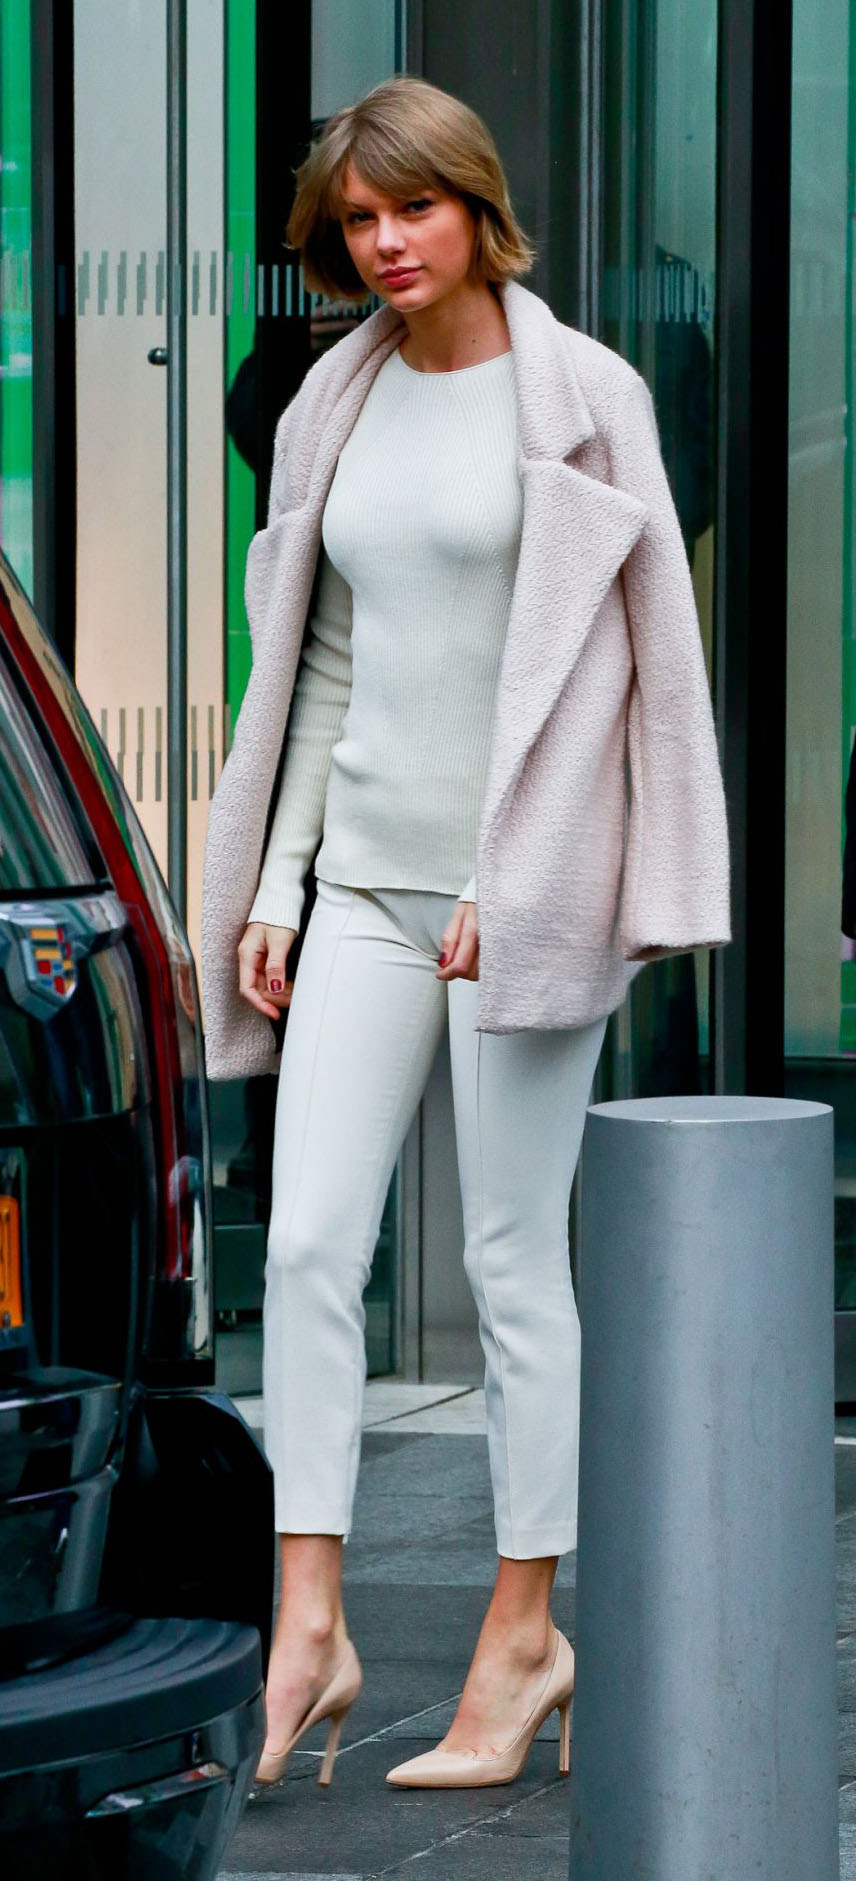 white-slim-pants-white-sweater-pink-light-jacket-coat-tan-shoe-pumps-taylorswift-fall-winter-blonde-work.jpg